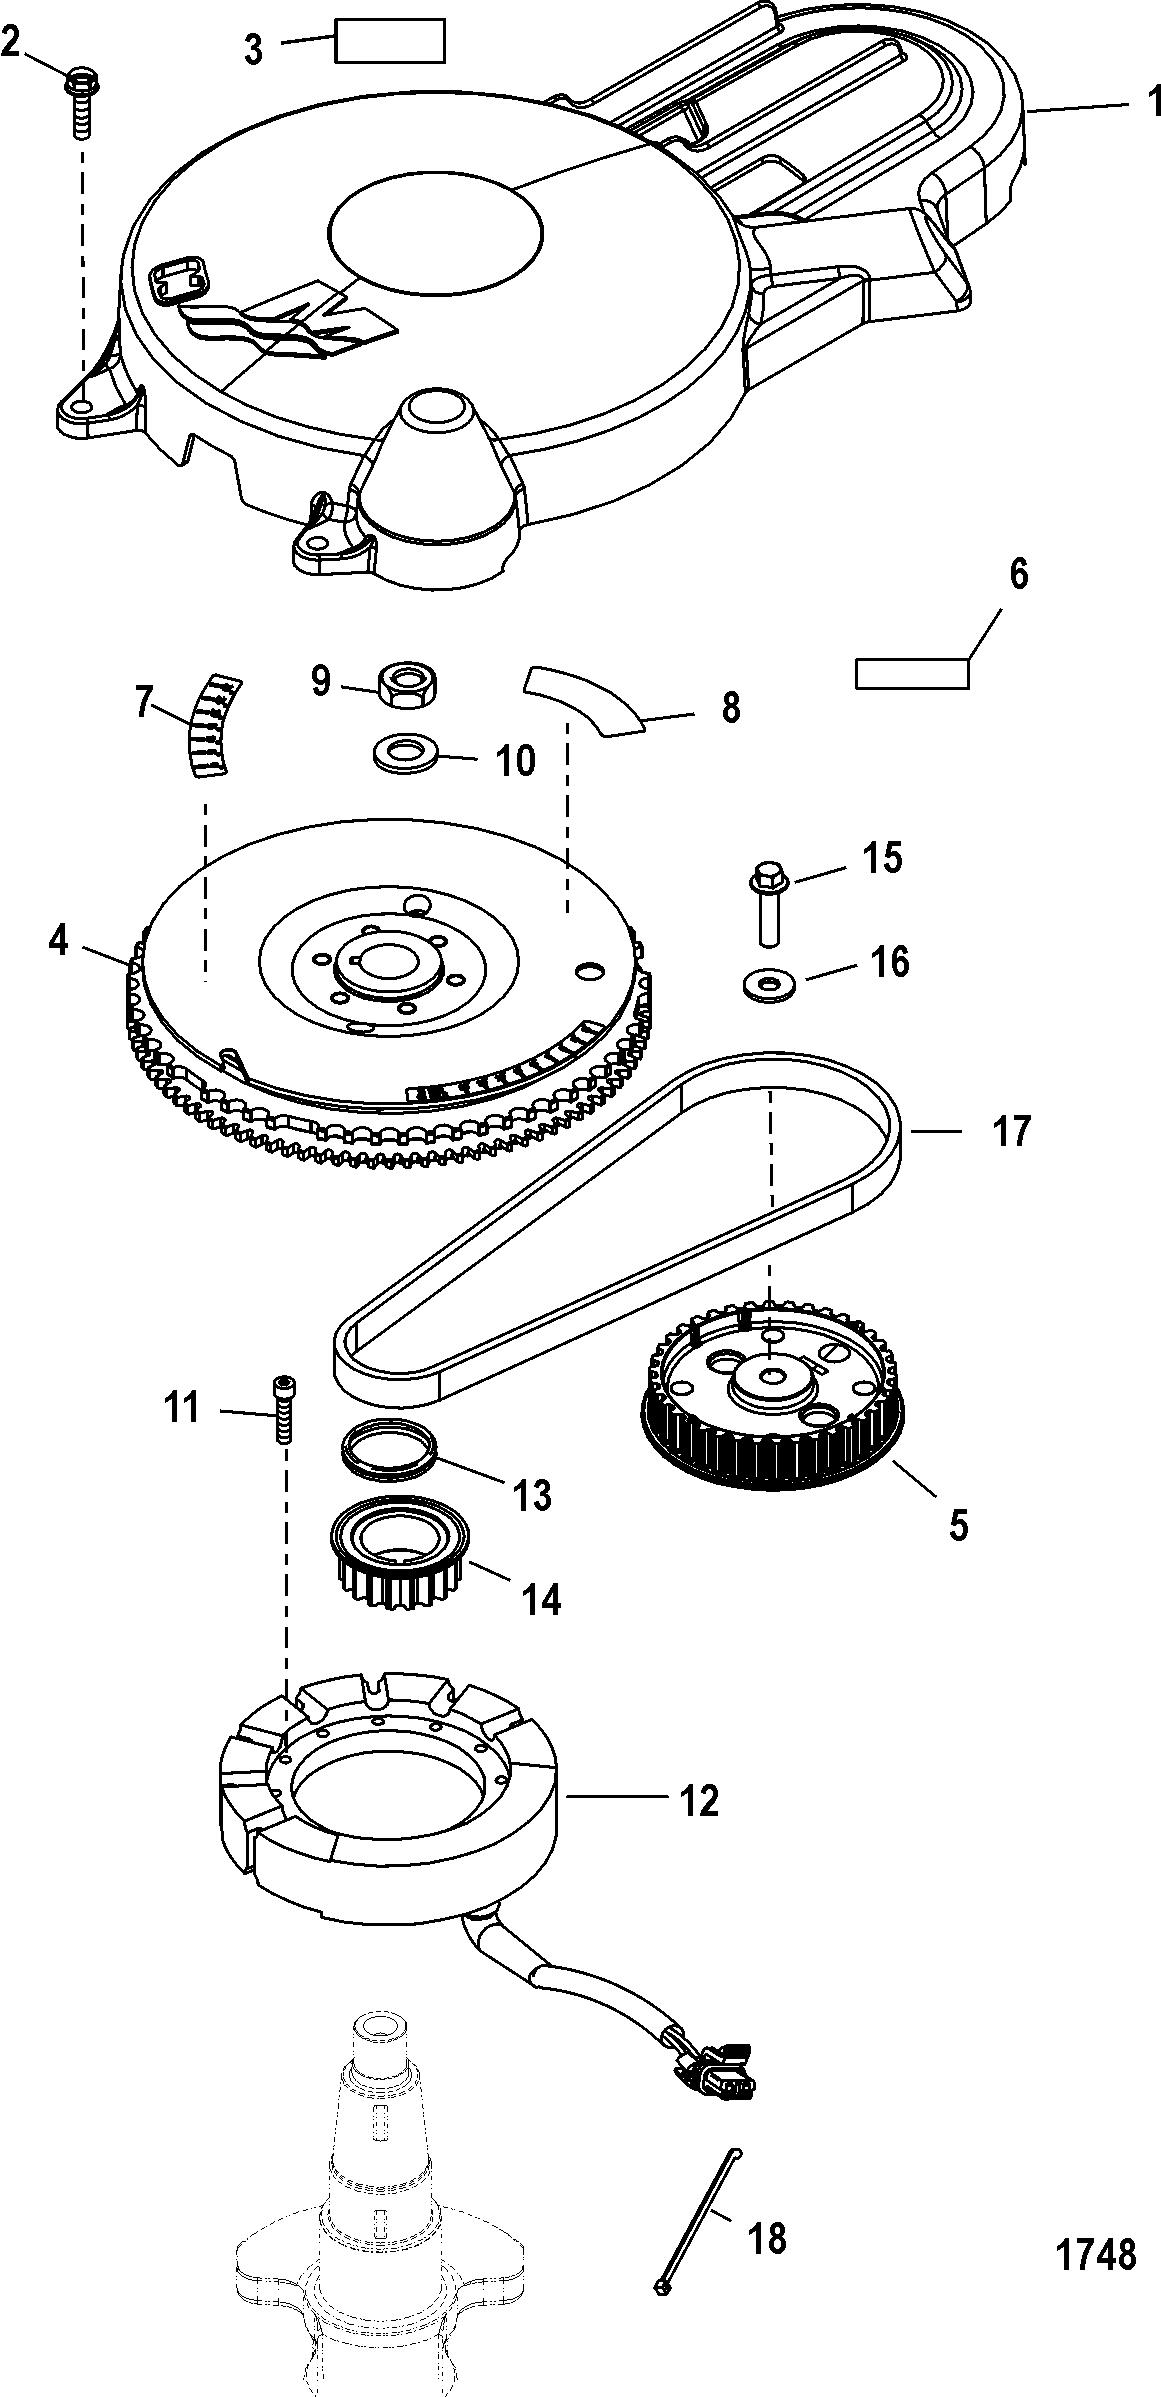 Flywheel FOR MARINER / MERCURY 40/50/60 EFI 4 CYLINDER 4